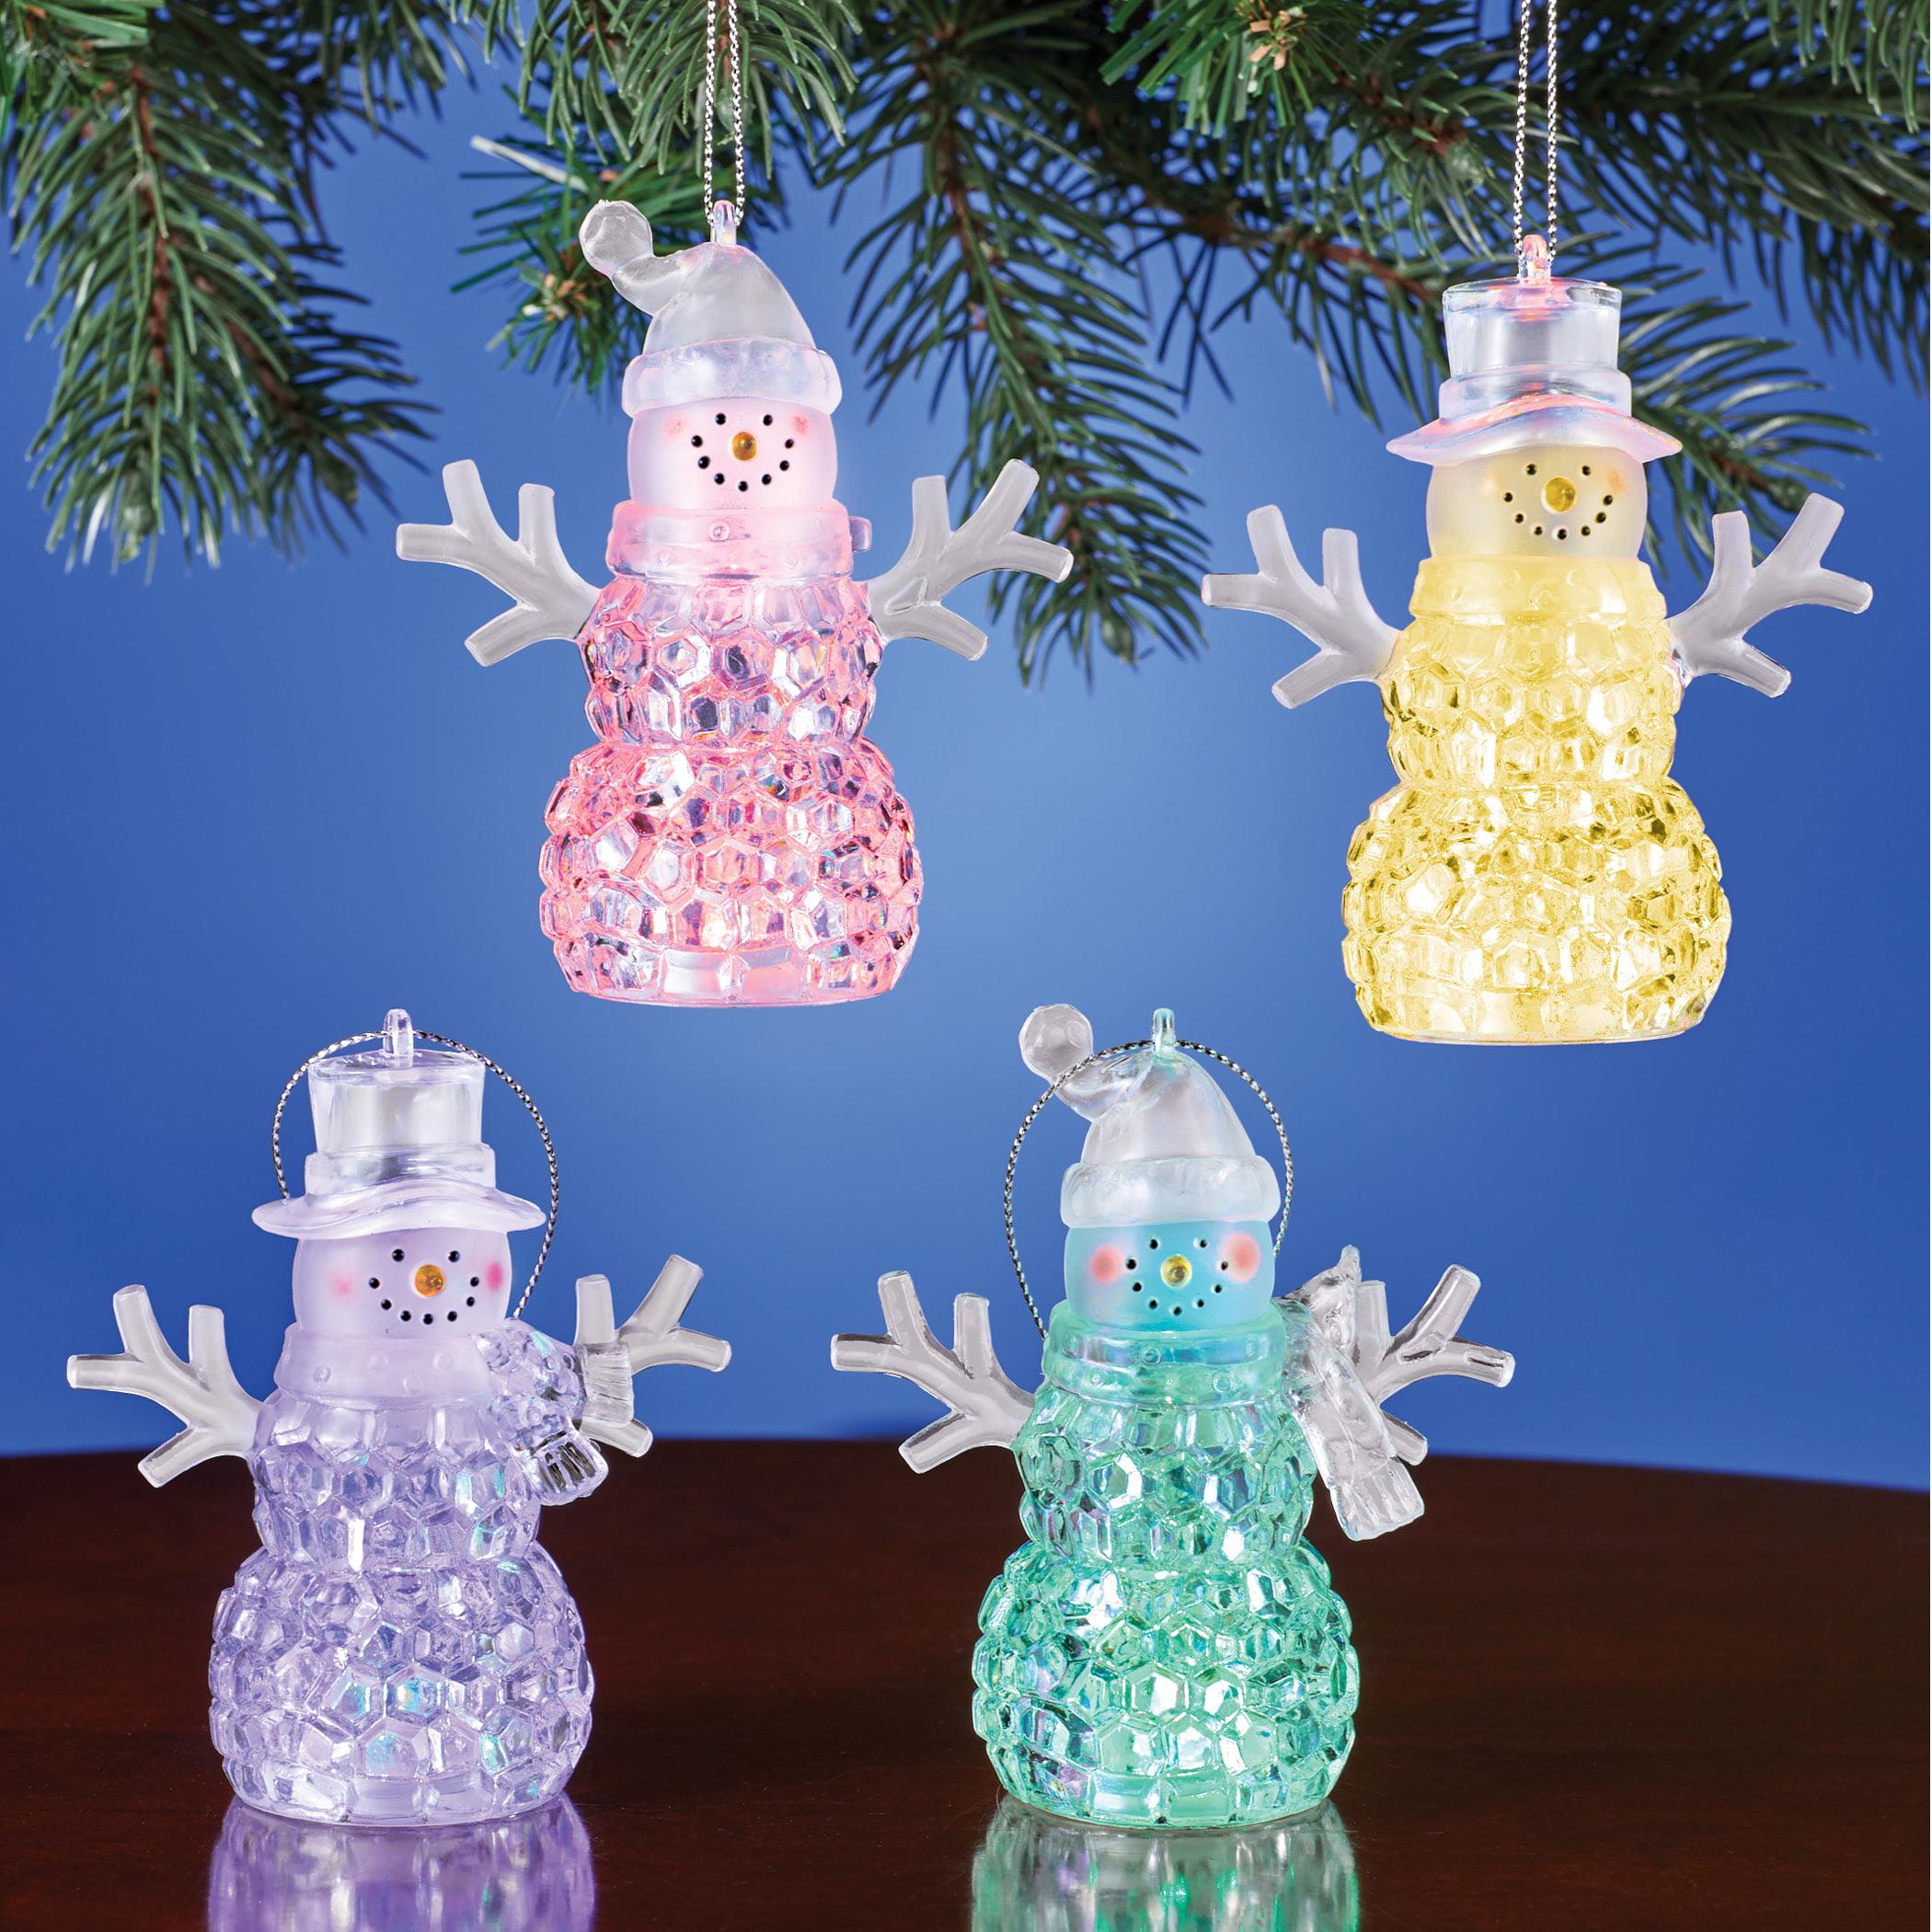 Led Snowmen Christmas Tree Ornaments Set Of 4 Collections Etc Walmart Com Walmart Com